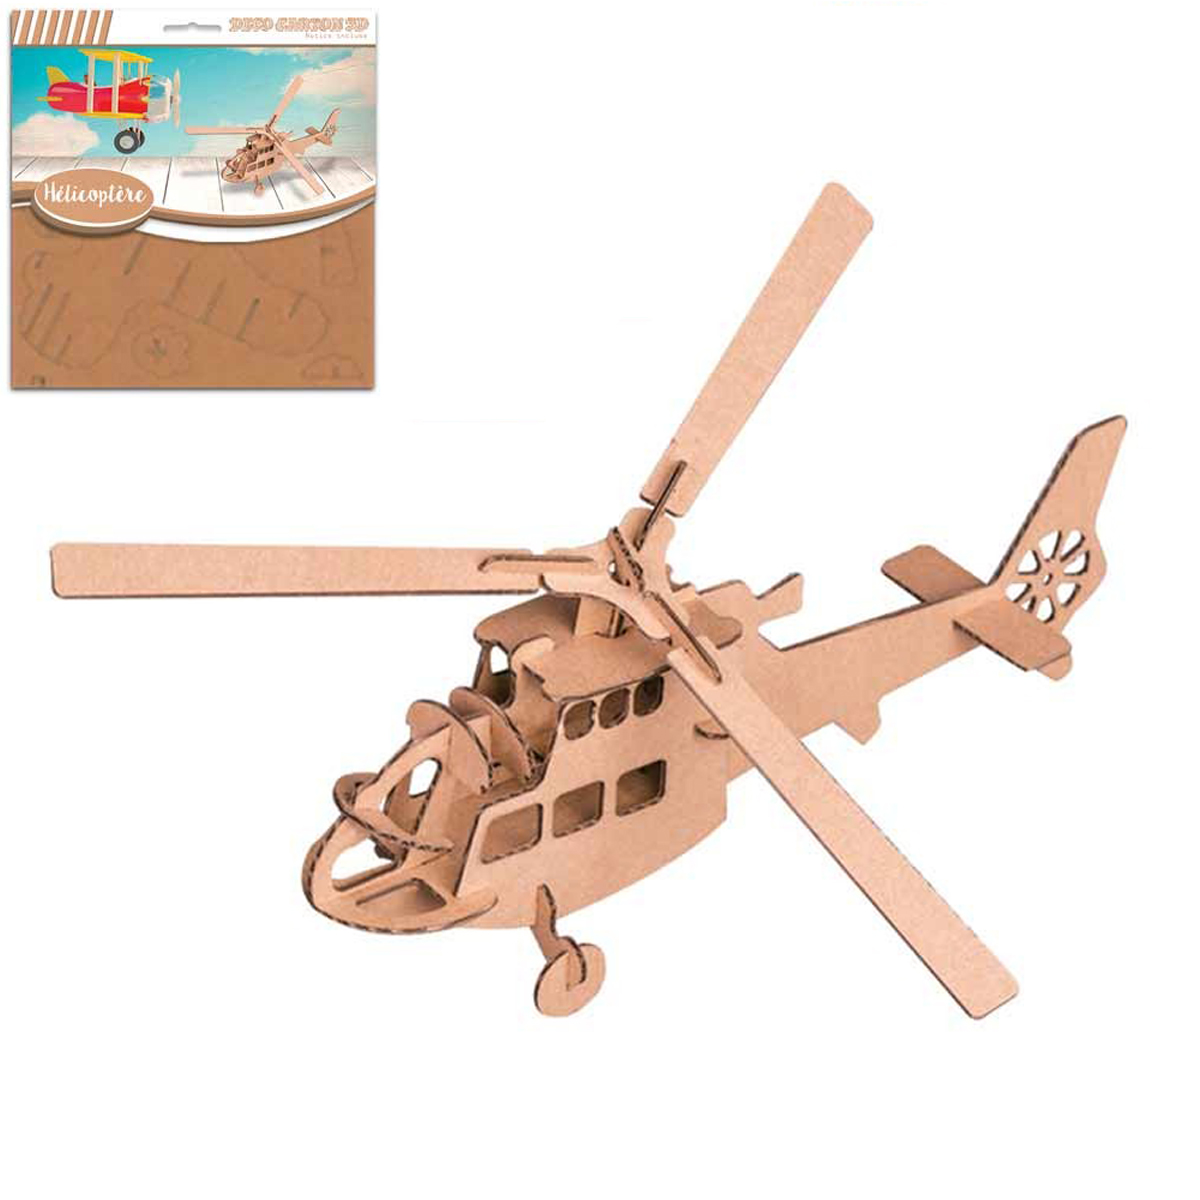 Figurine carton 3D \'Helicoptère\' - planches 165x175 cm - [Q9219]